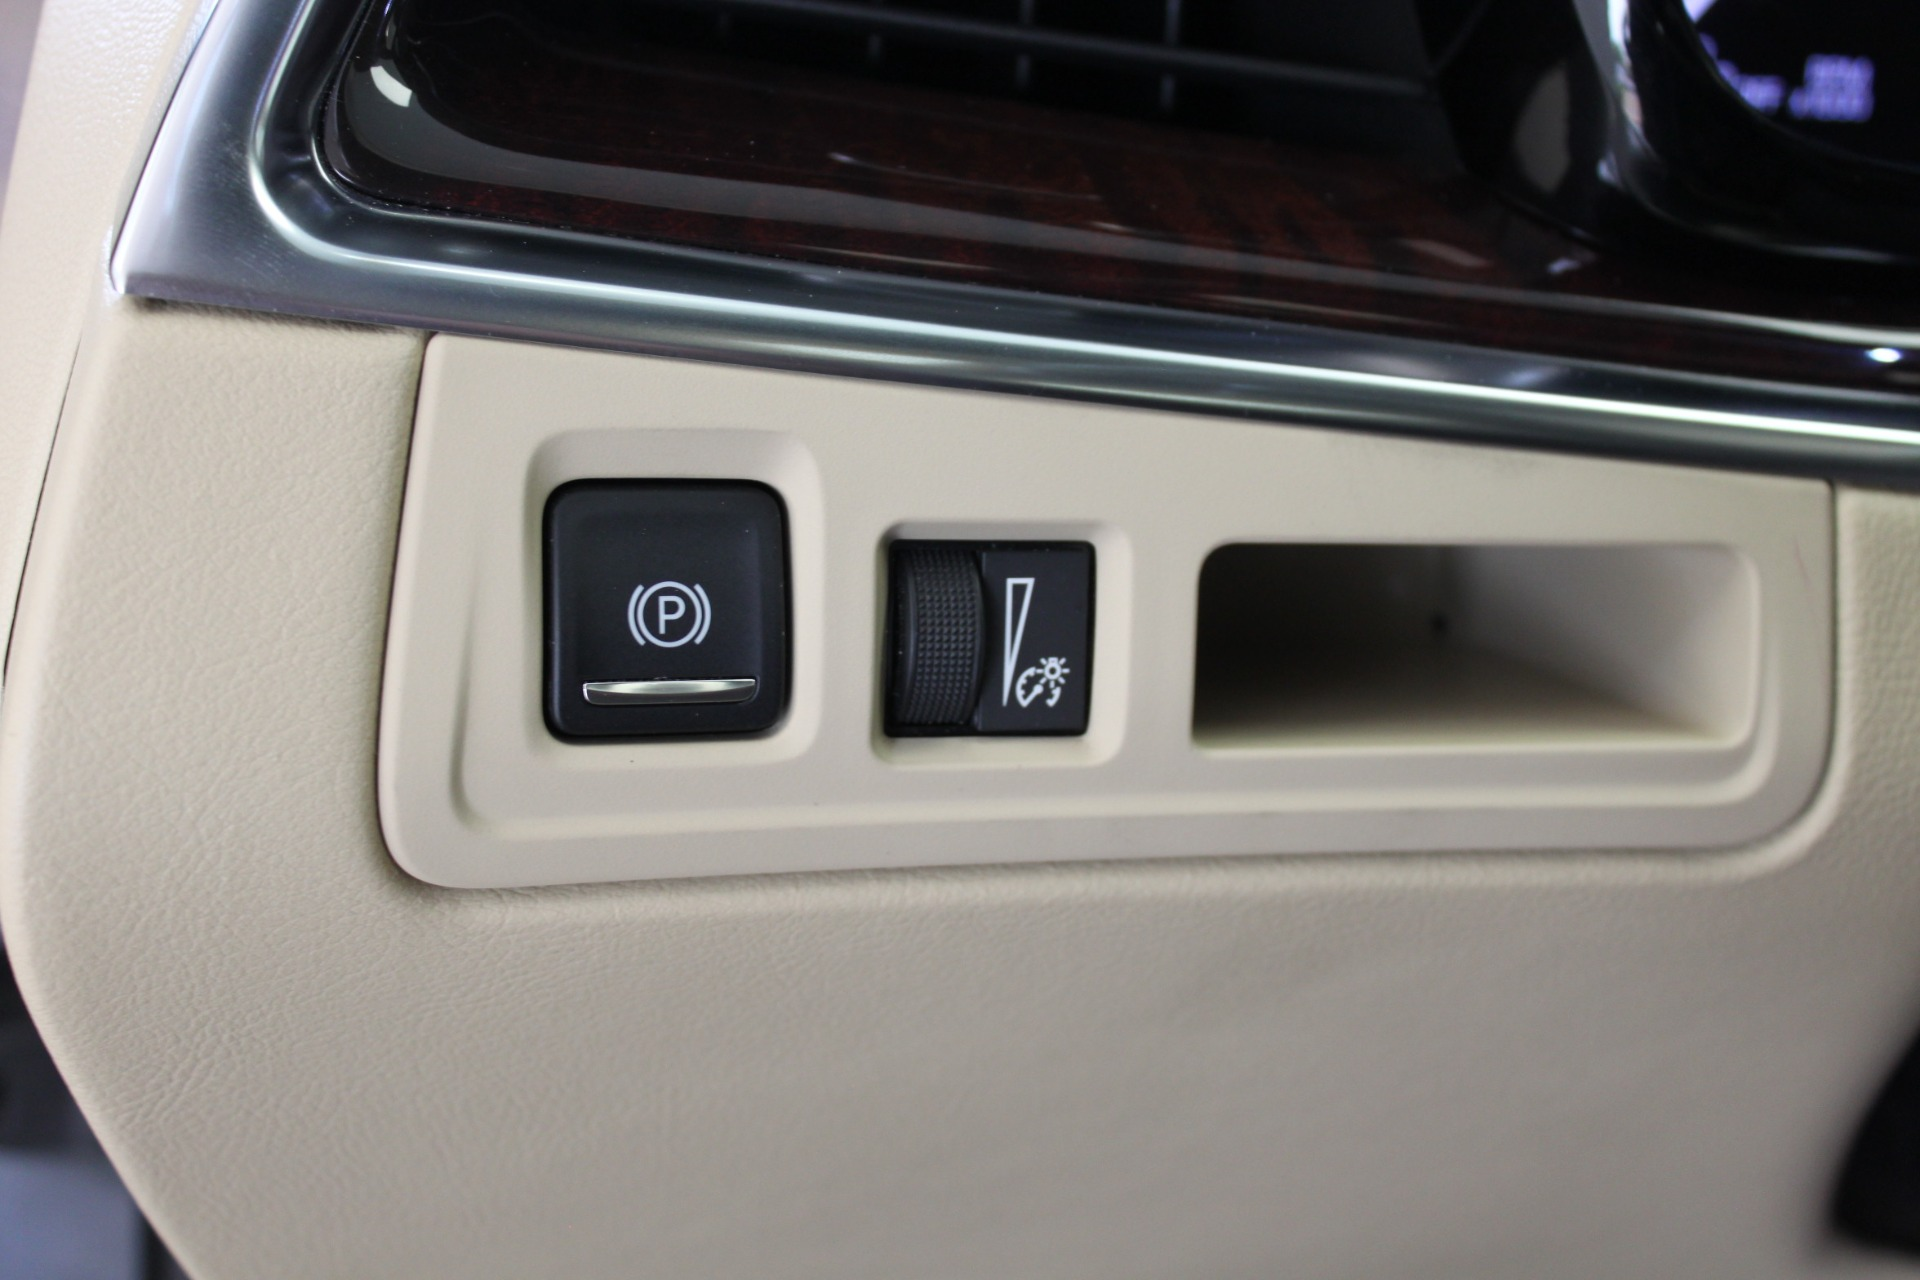 Used-2017-Cadillac-XT5-Luxury-All-Wheel-Drive-Luxury-AWD-Wrangler